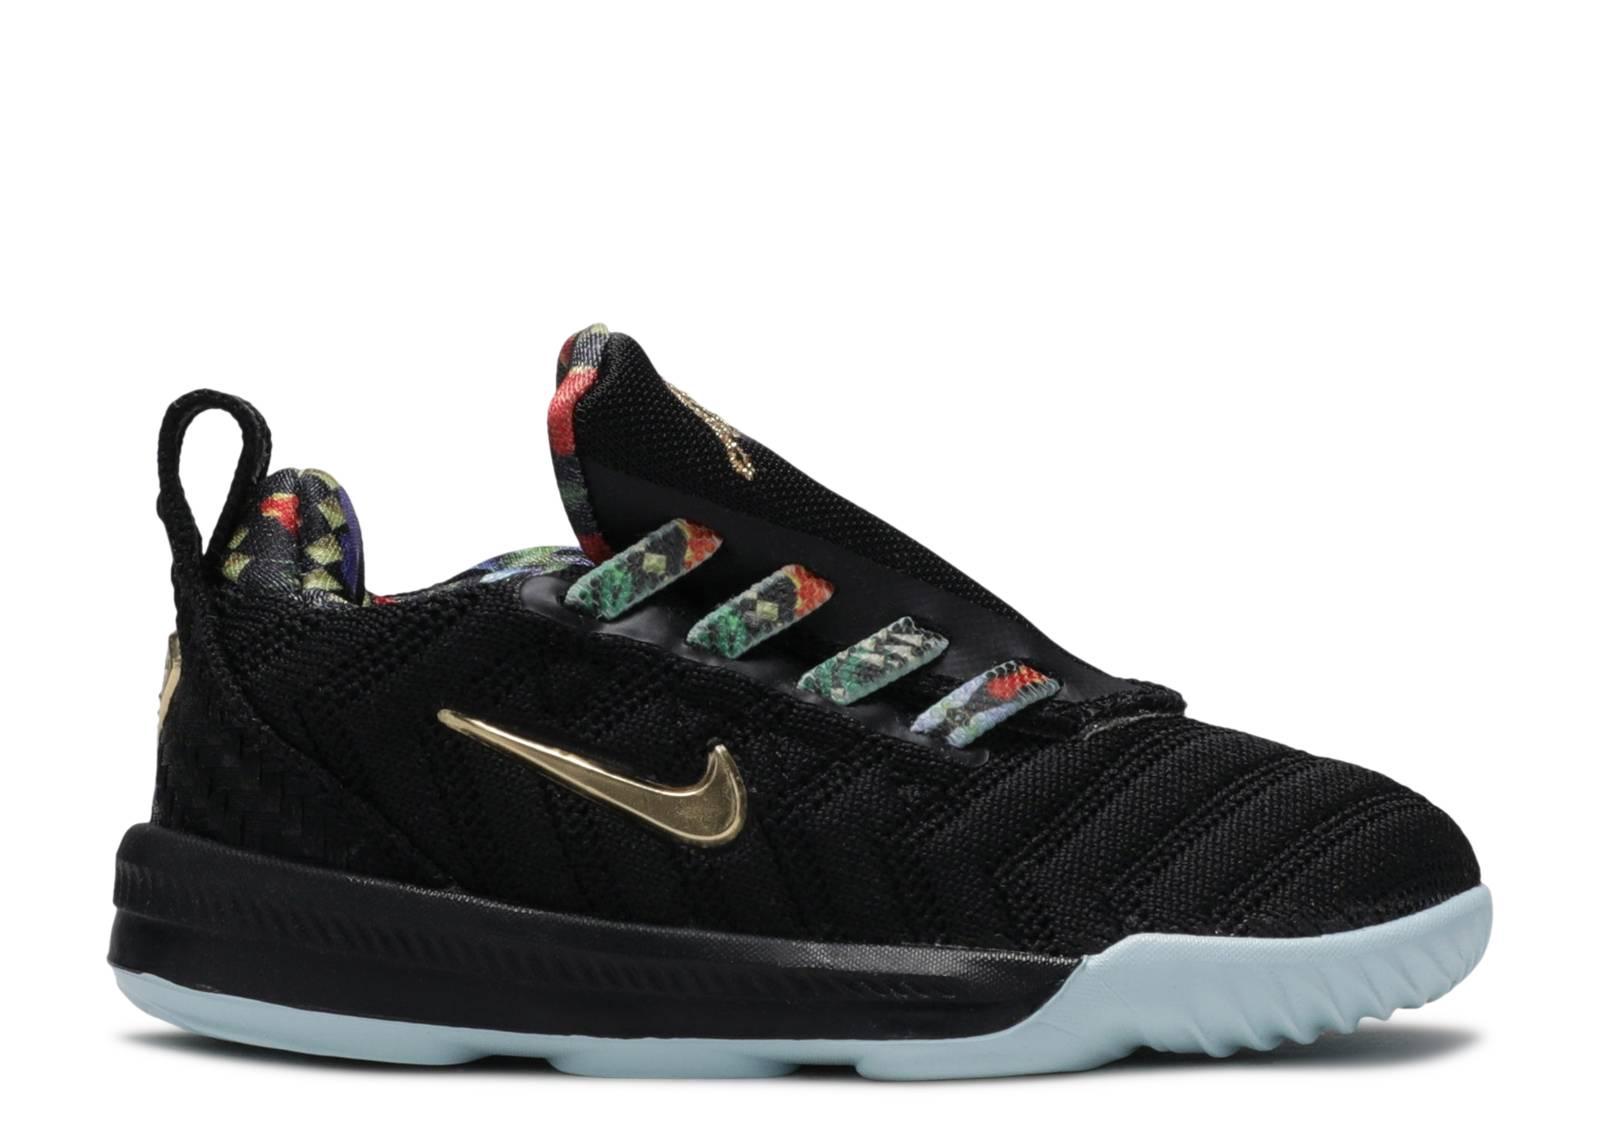 9b462d2956f Nike LeBron 16 KC